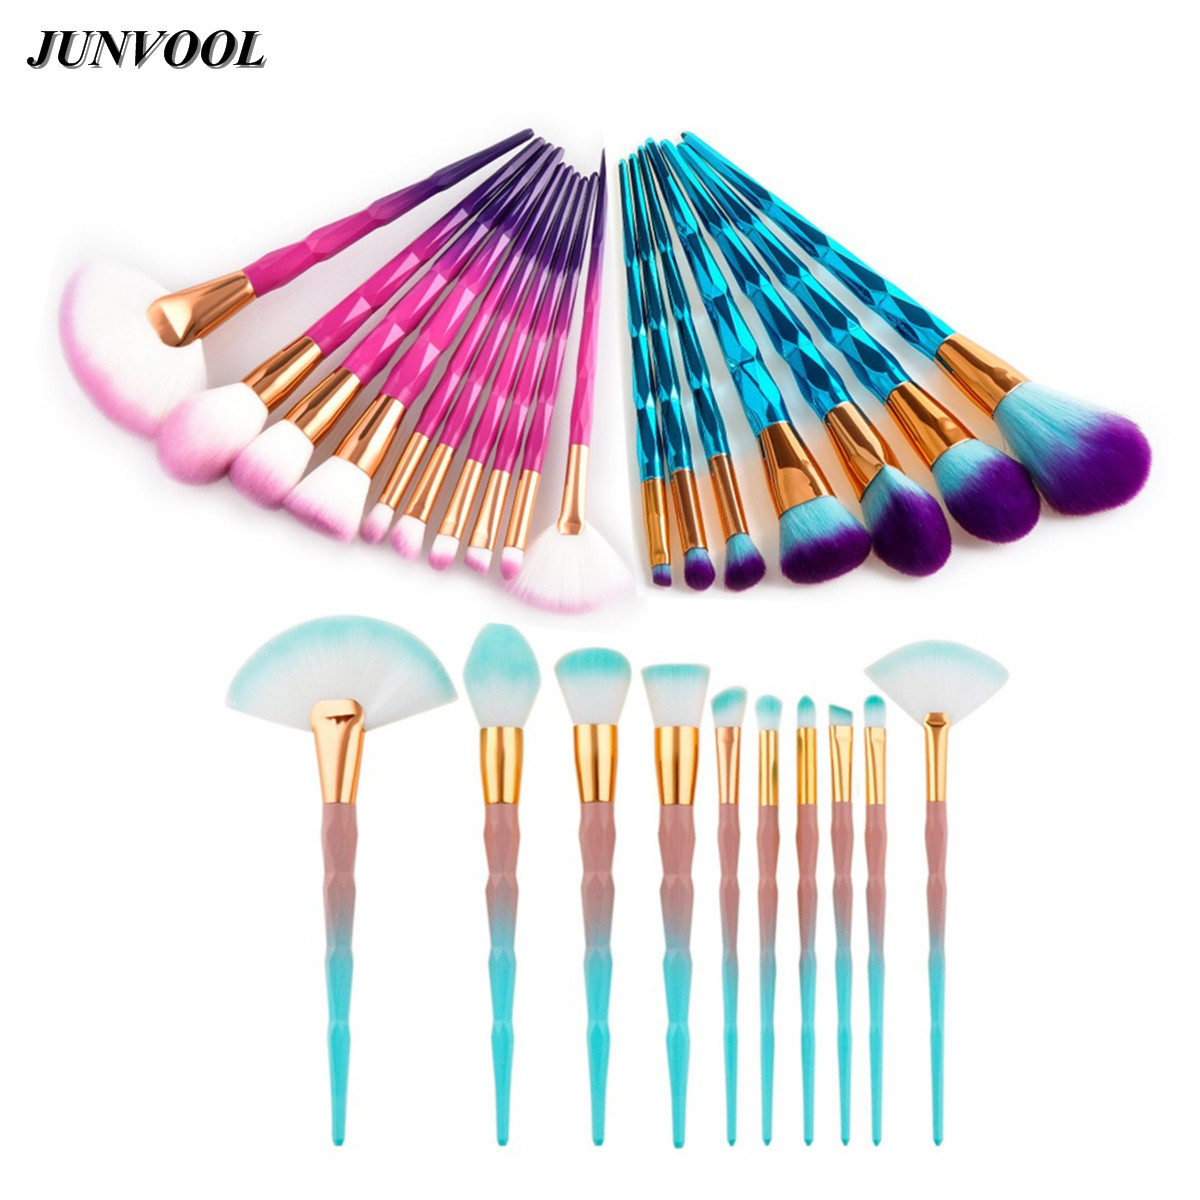 Pro Diamond Design Rainbow Handle Makeup Brushes Set Foundation Powder Blush Eye Shadow Lip Fan Brush Face Beauty Makeup Tools fan makeup brush set 9pcs rainbow diy